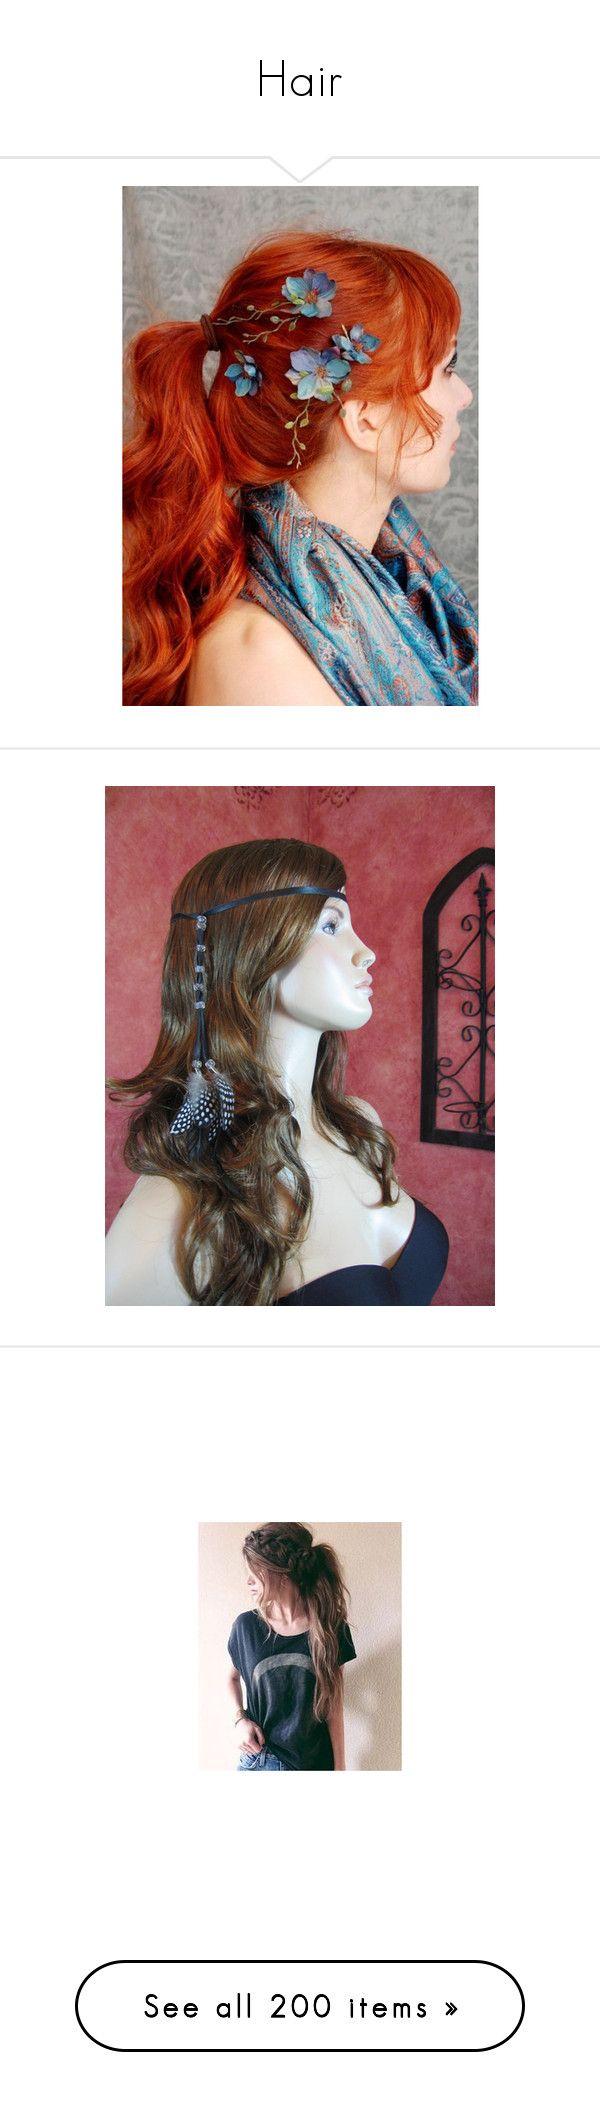 """Hair"" by rosemary-mackintosh ❤ liked on Polyvore featuring accessories, hair accessories, headbands & turbans, teal, head wrap turban, boho hair accessories, hippie headbands, head wrap hair accessories, hippy headband and hair"